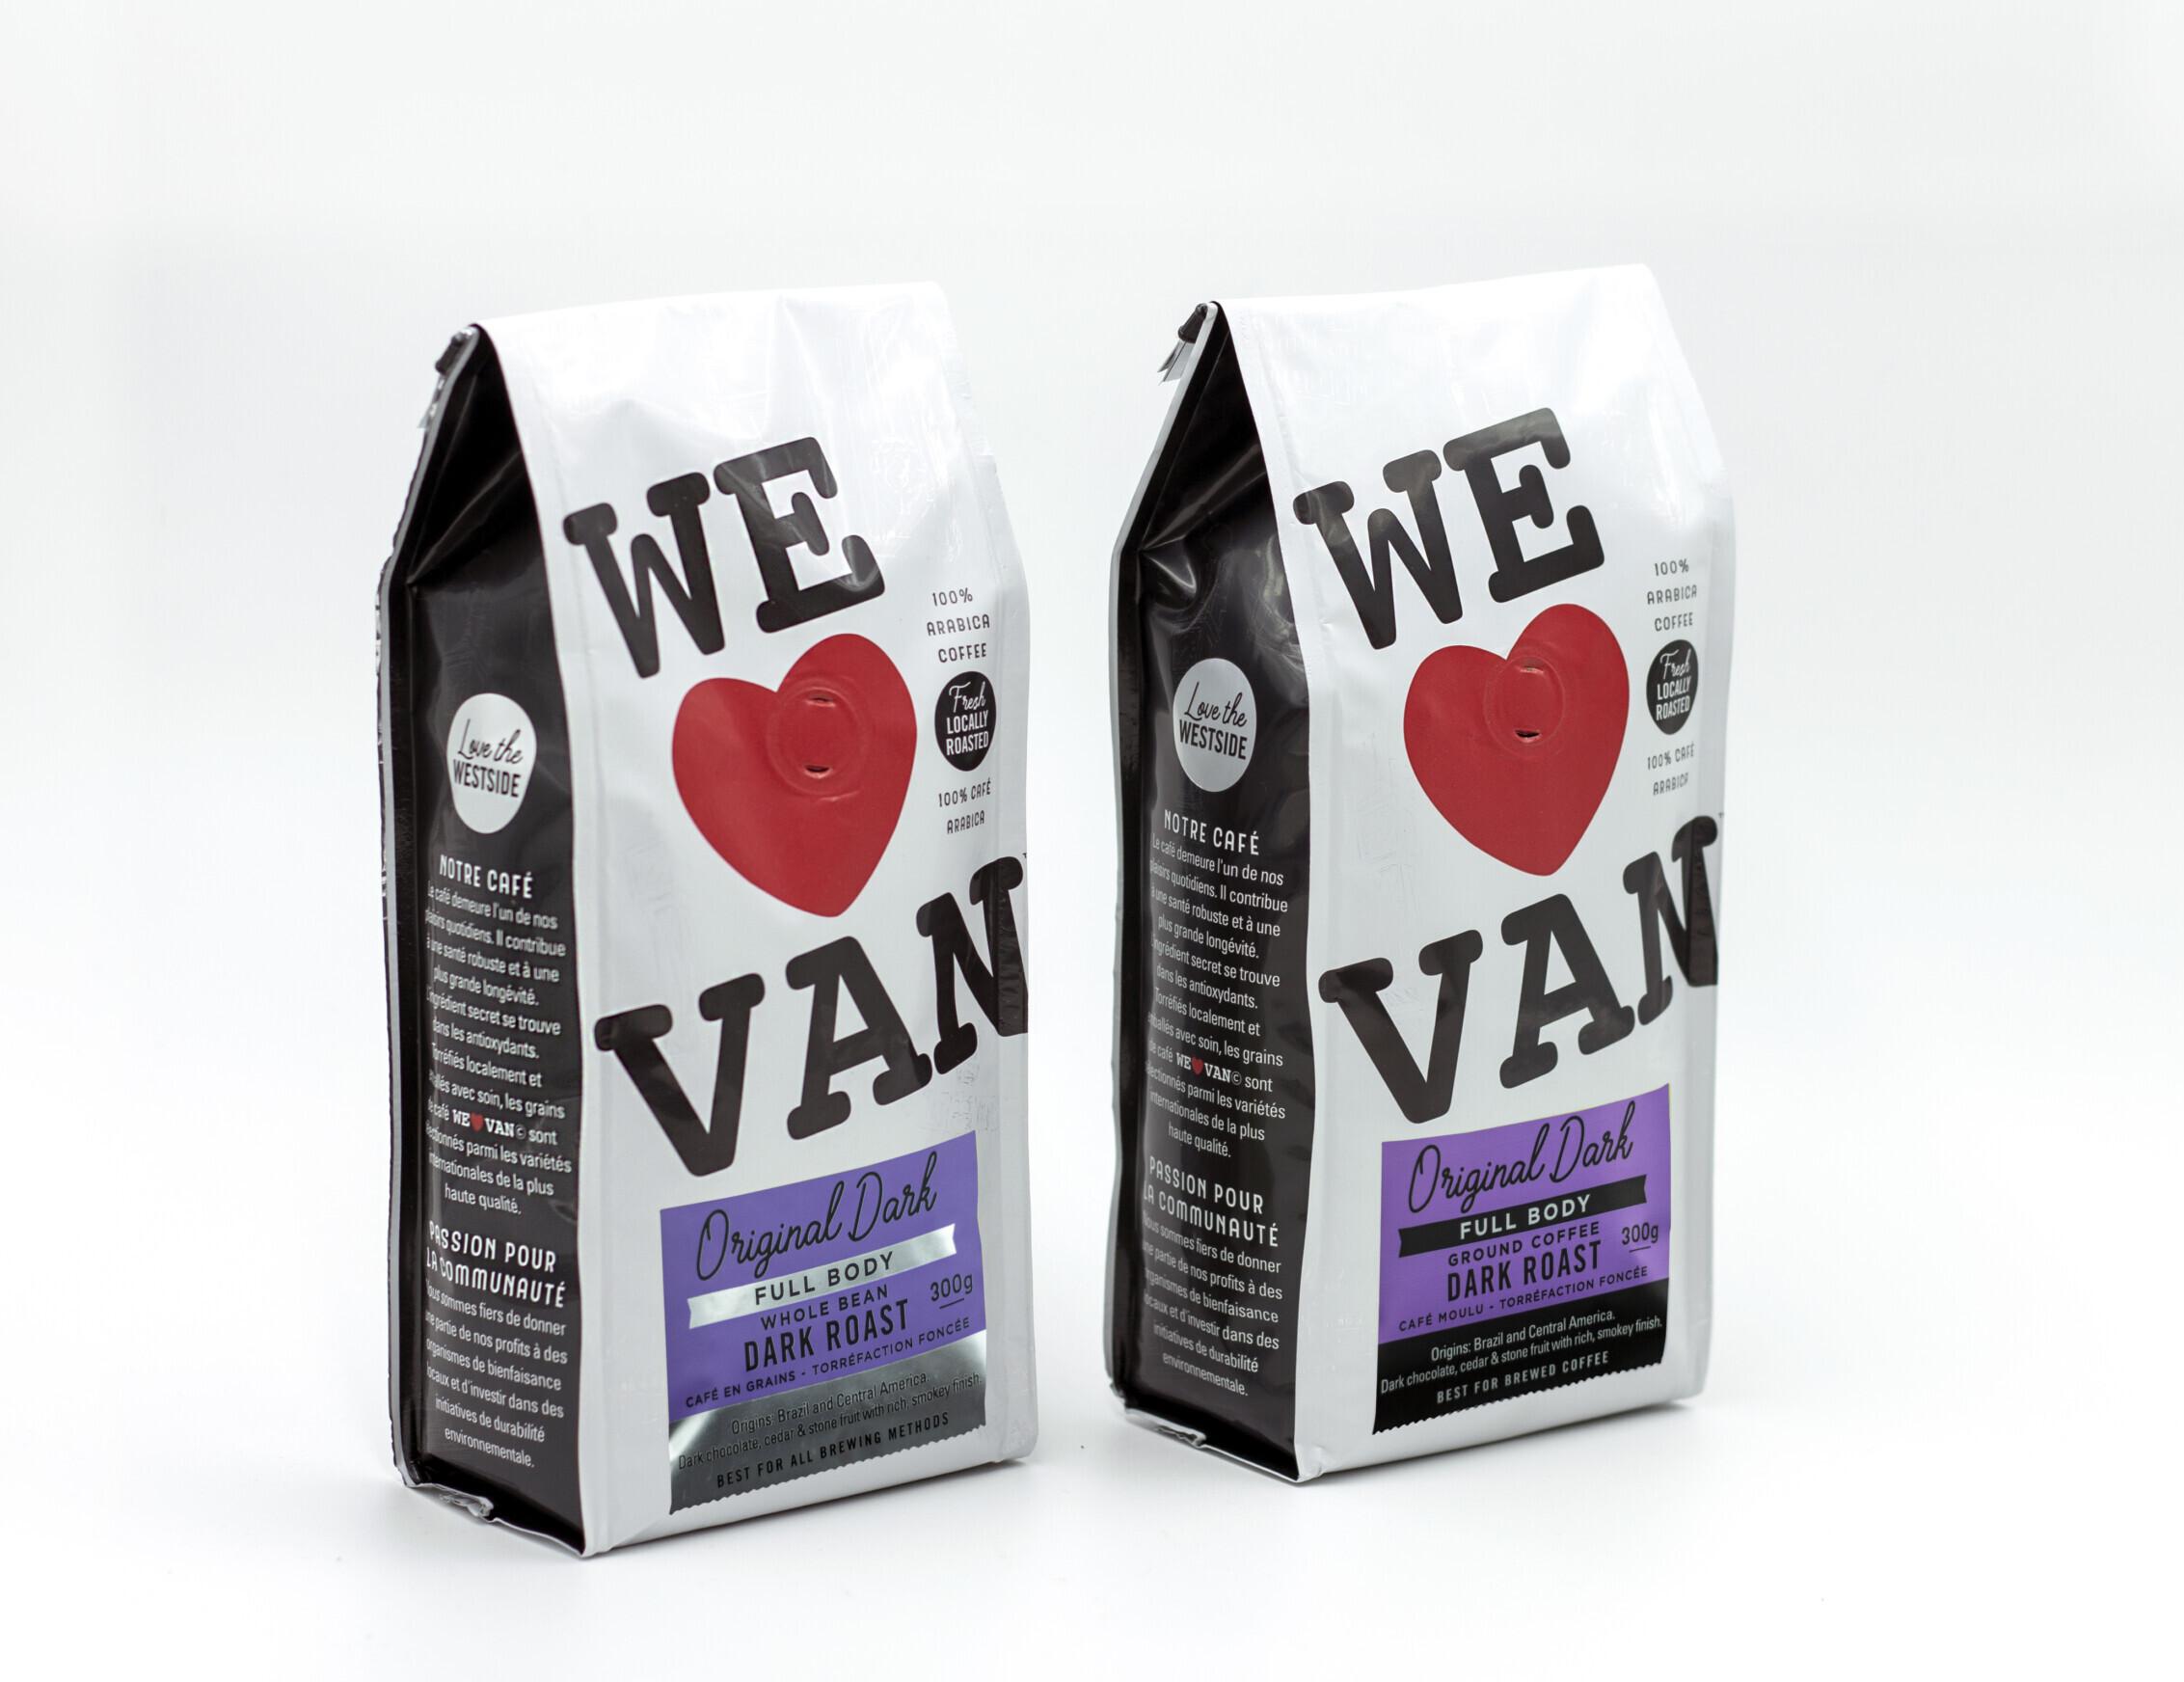 Original Dark Coffee